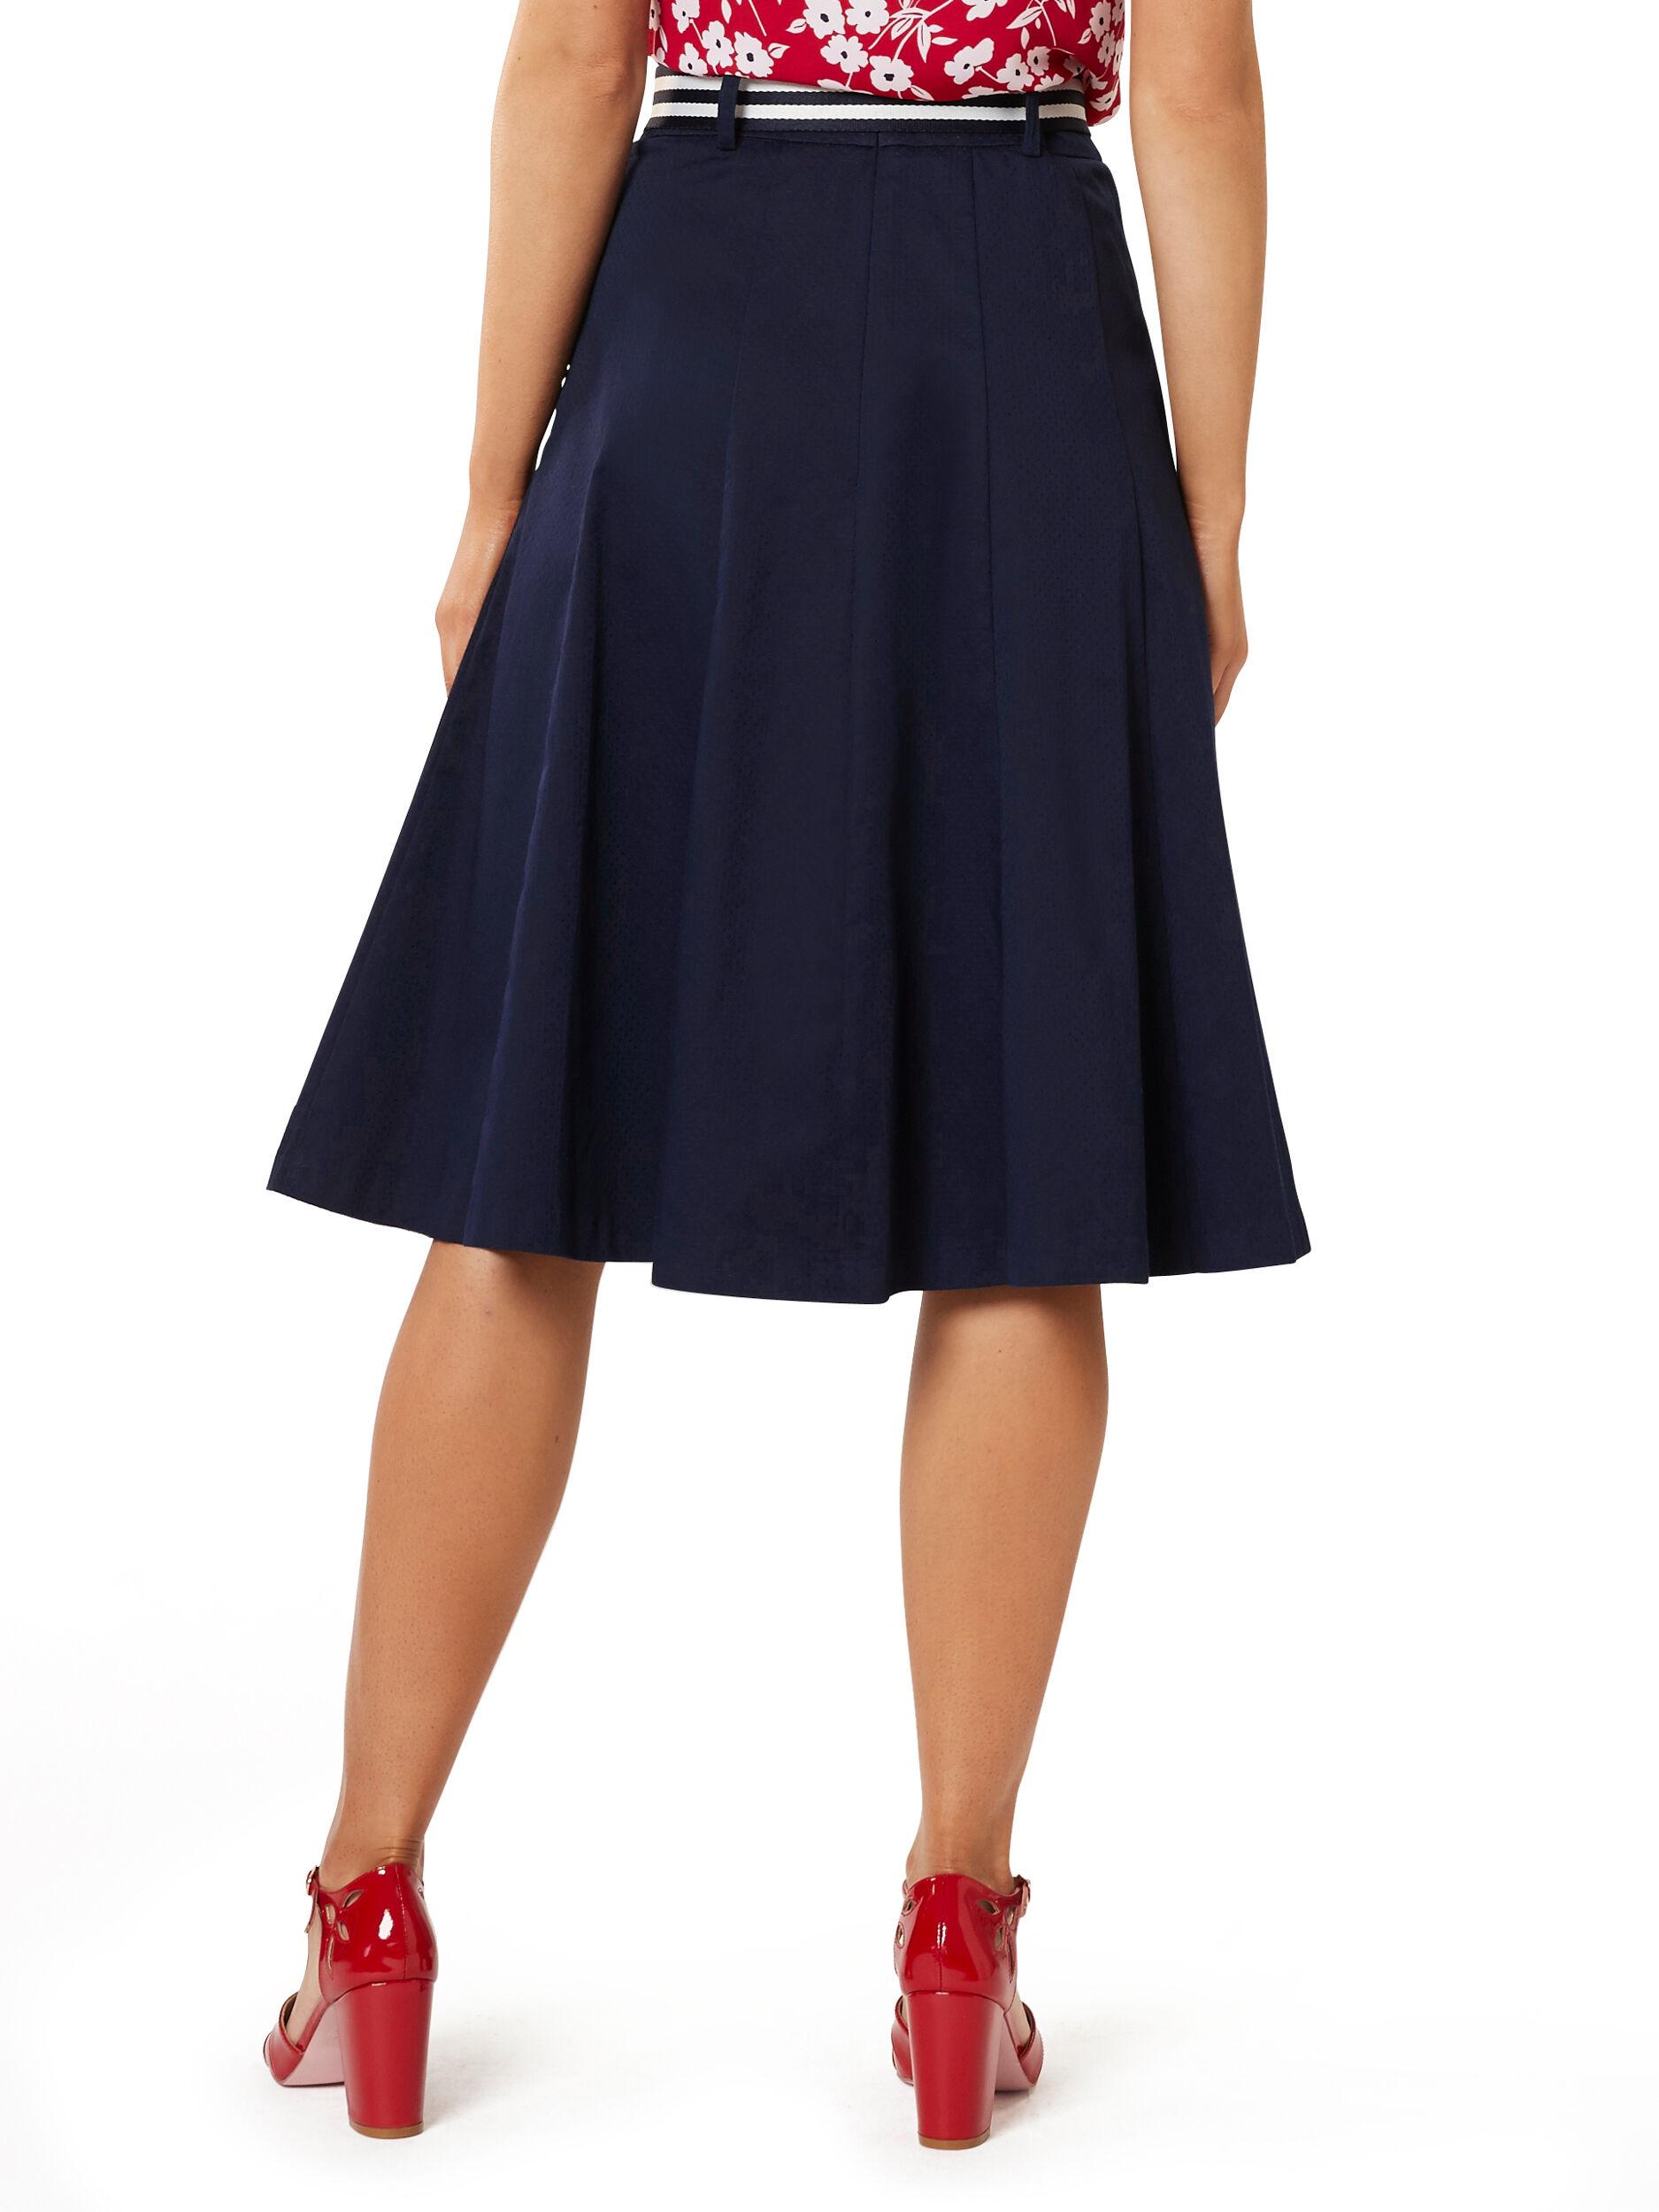 Panela Midi Skirt